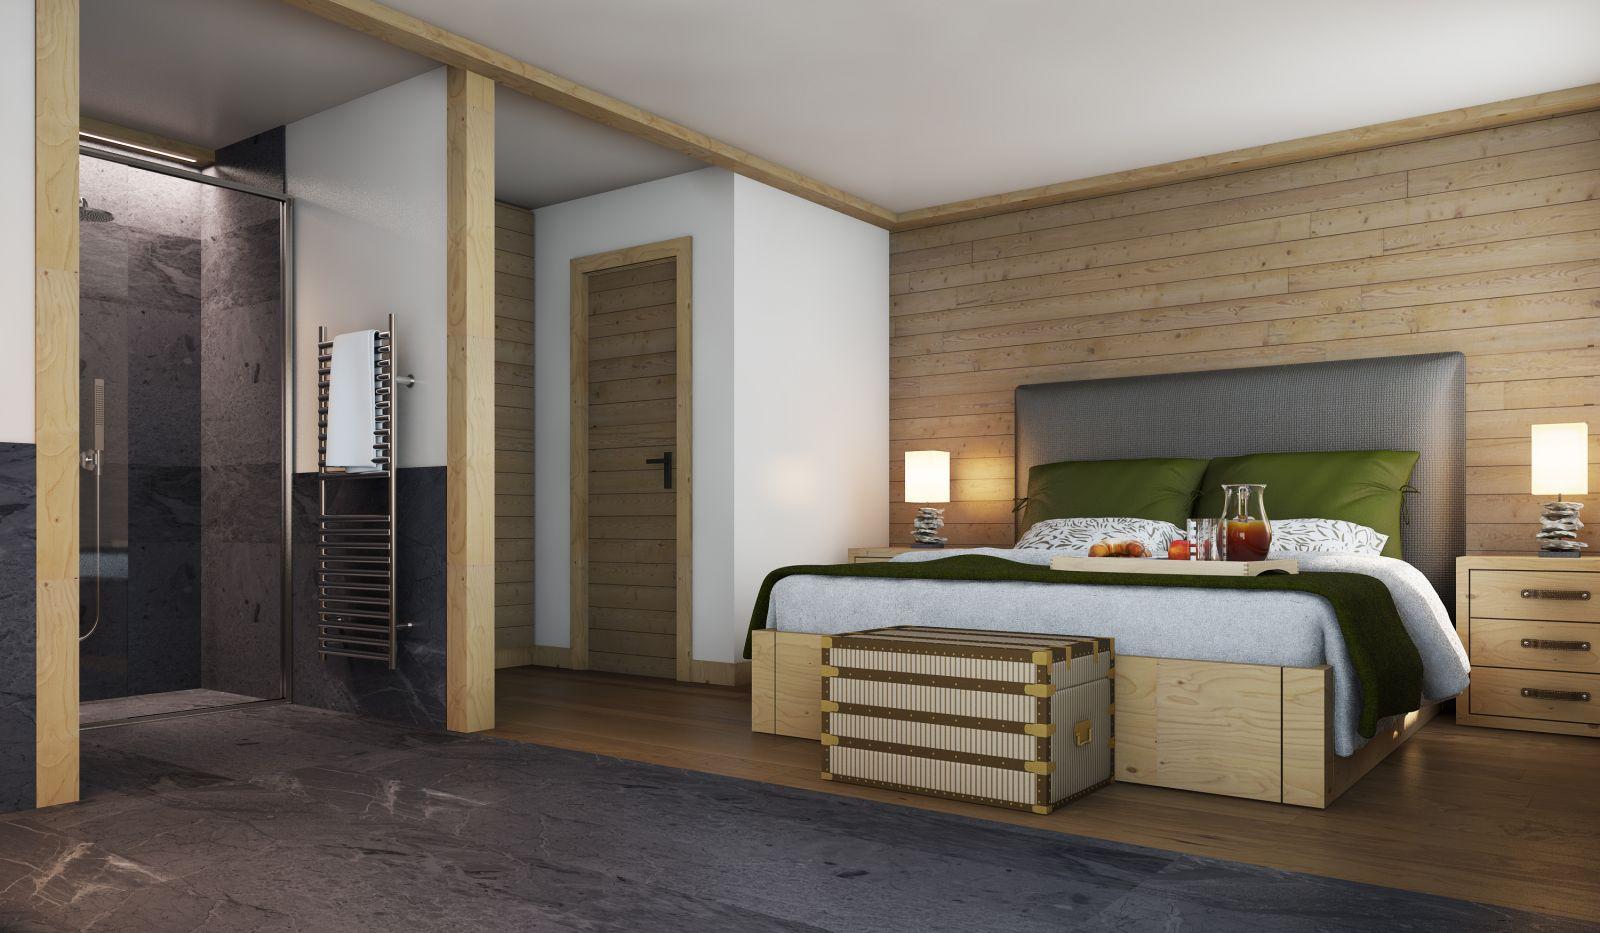 Walserhof Hotel - Kloster 444